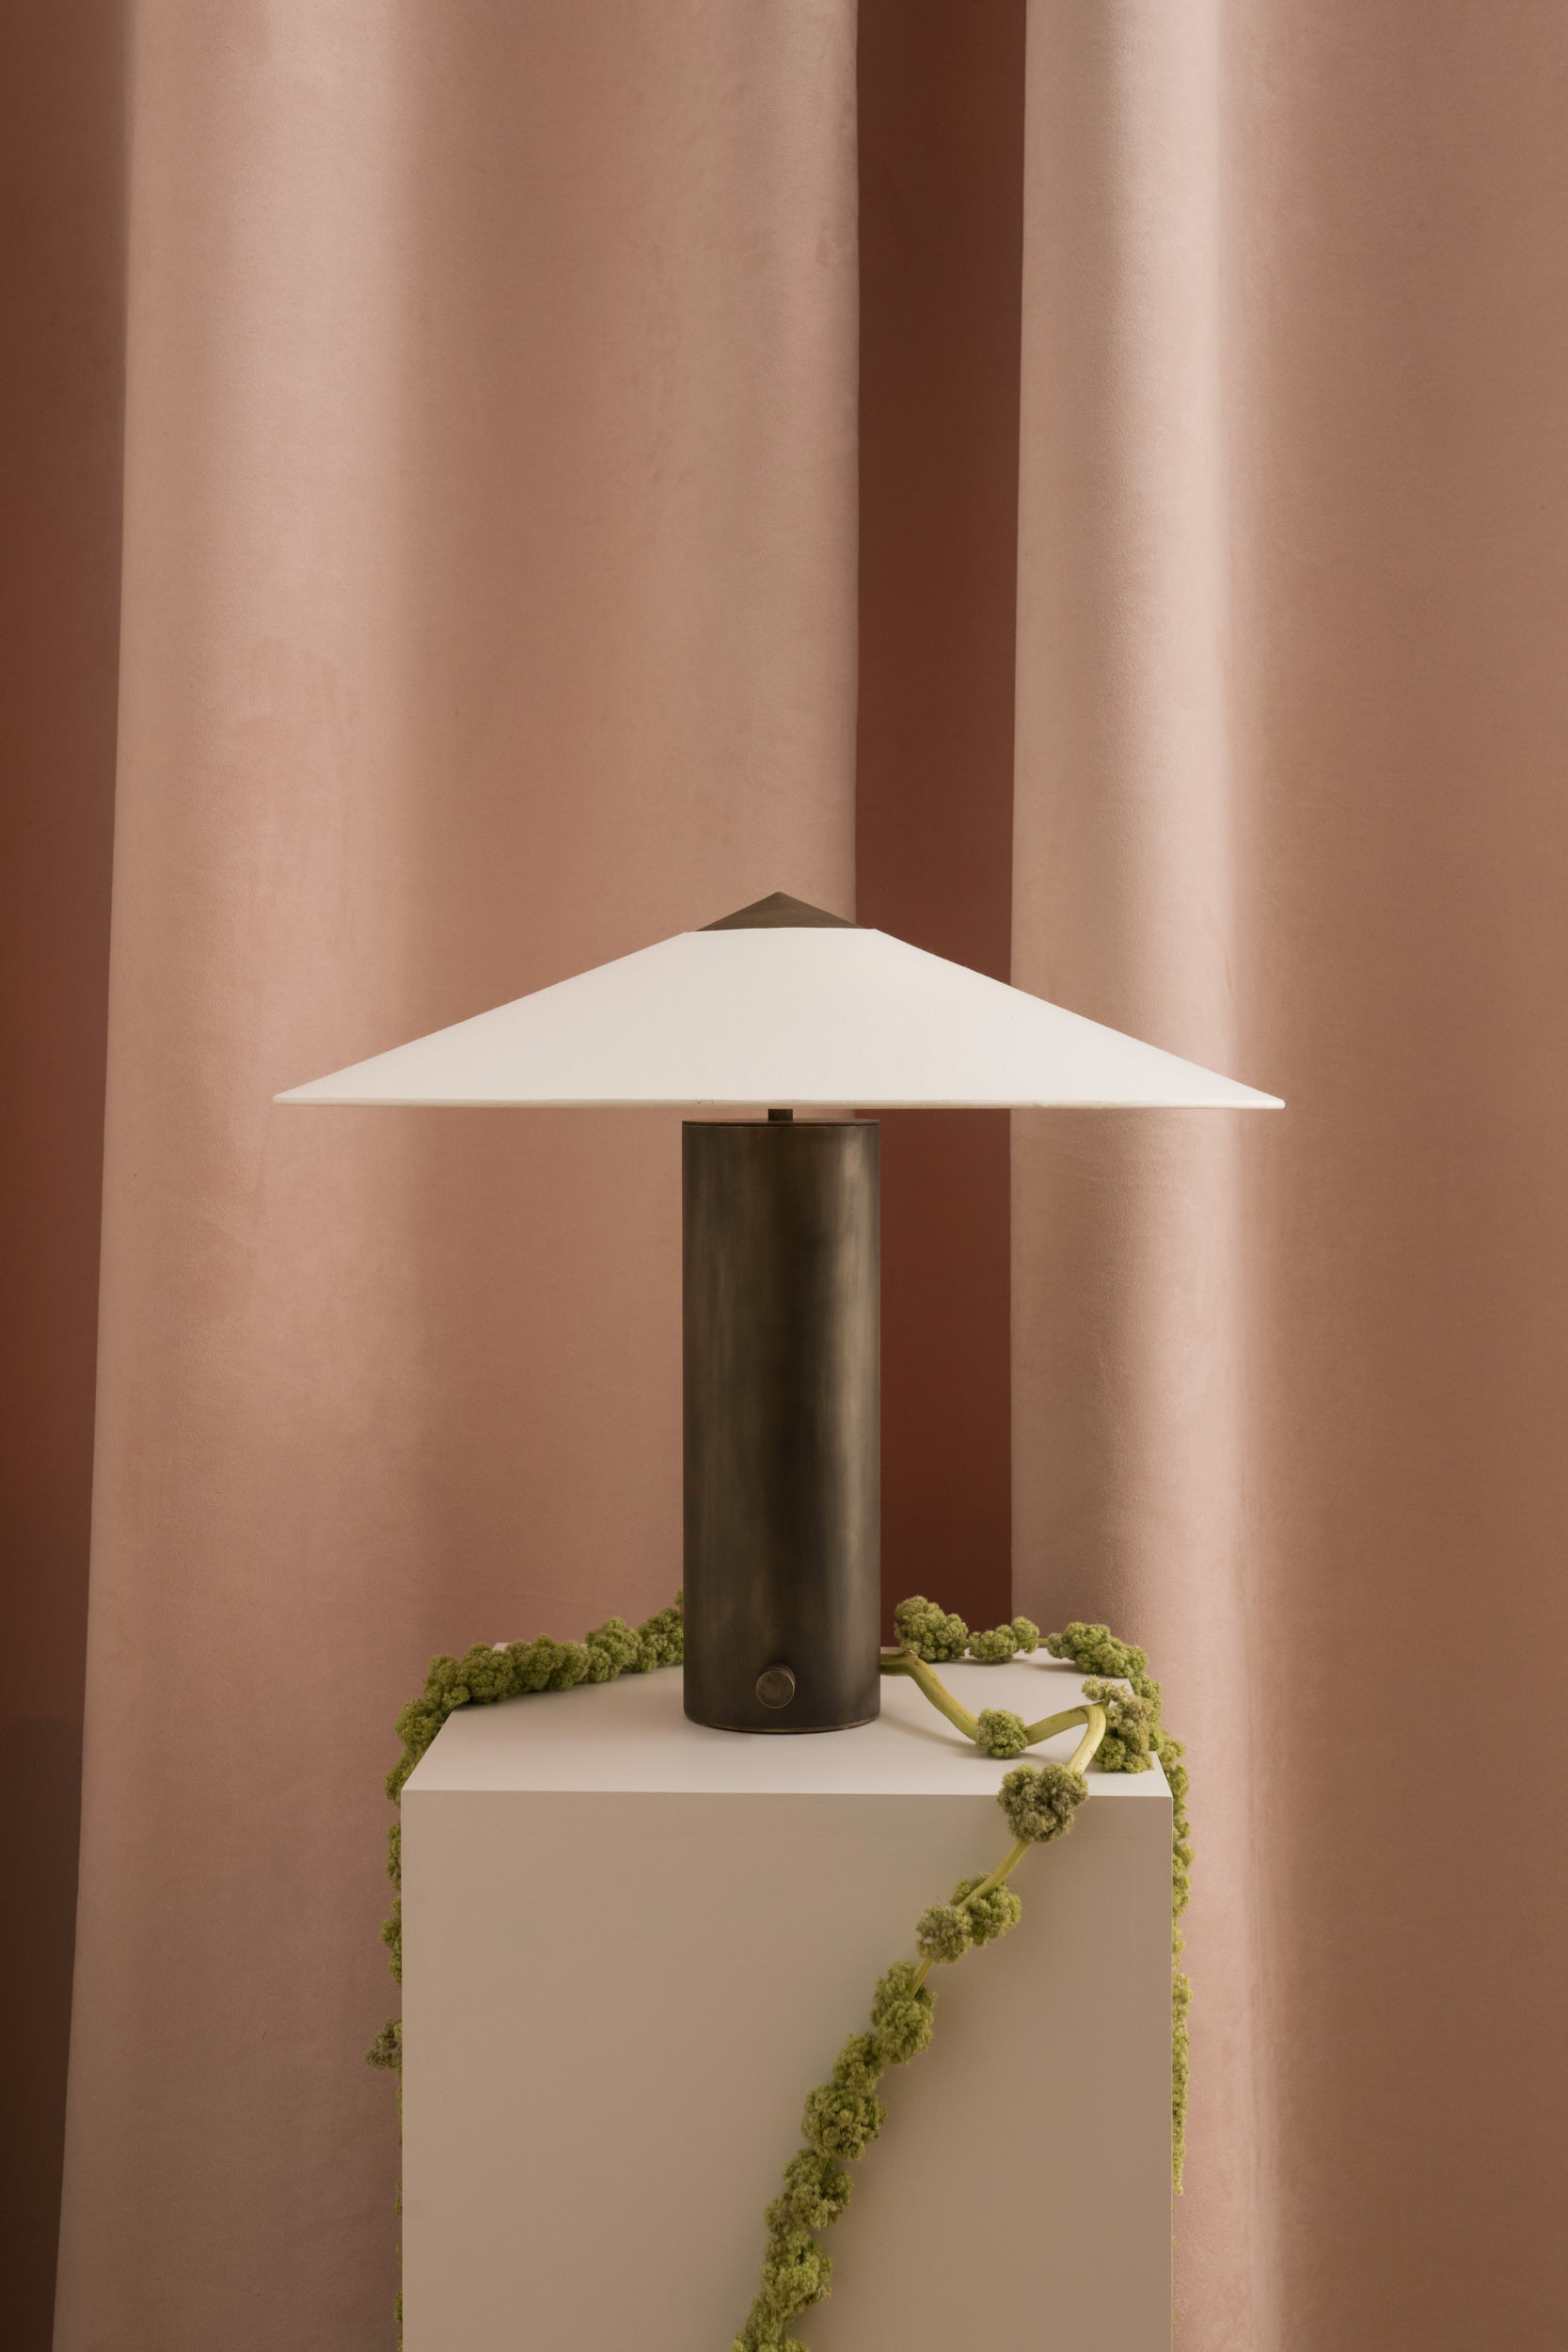 yamatablelamp_small_coilanddrift_byseandavidson10.jpg